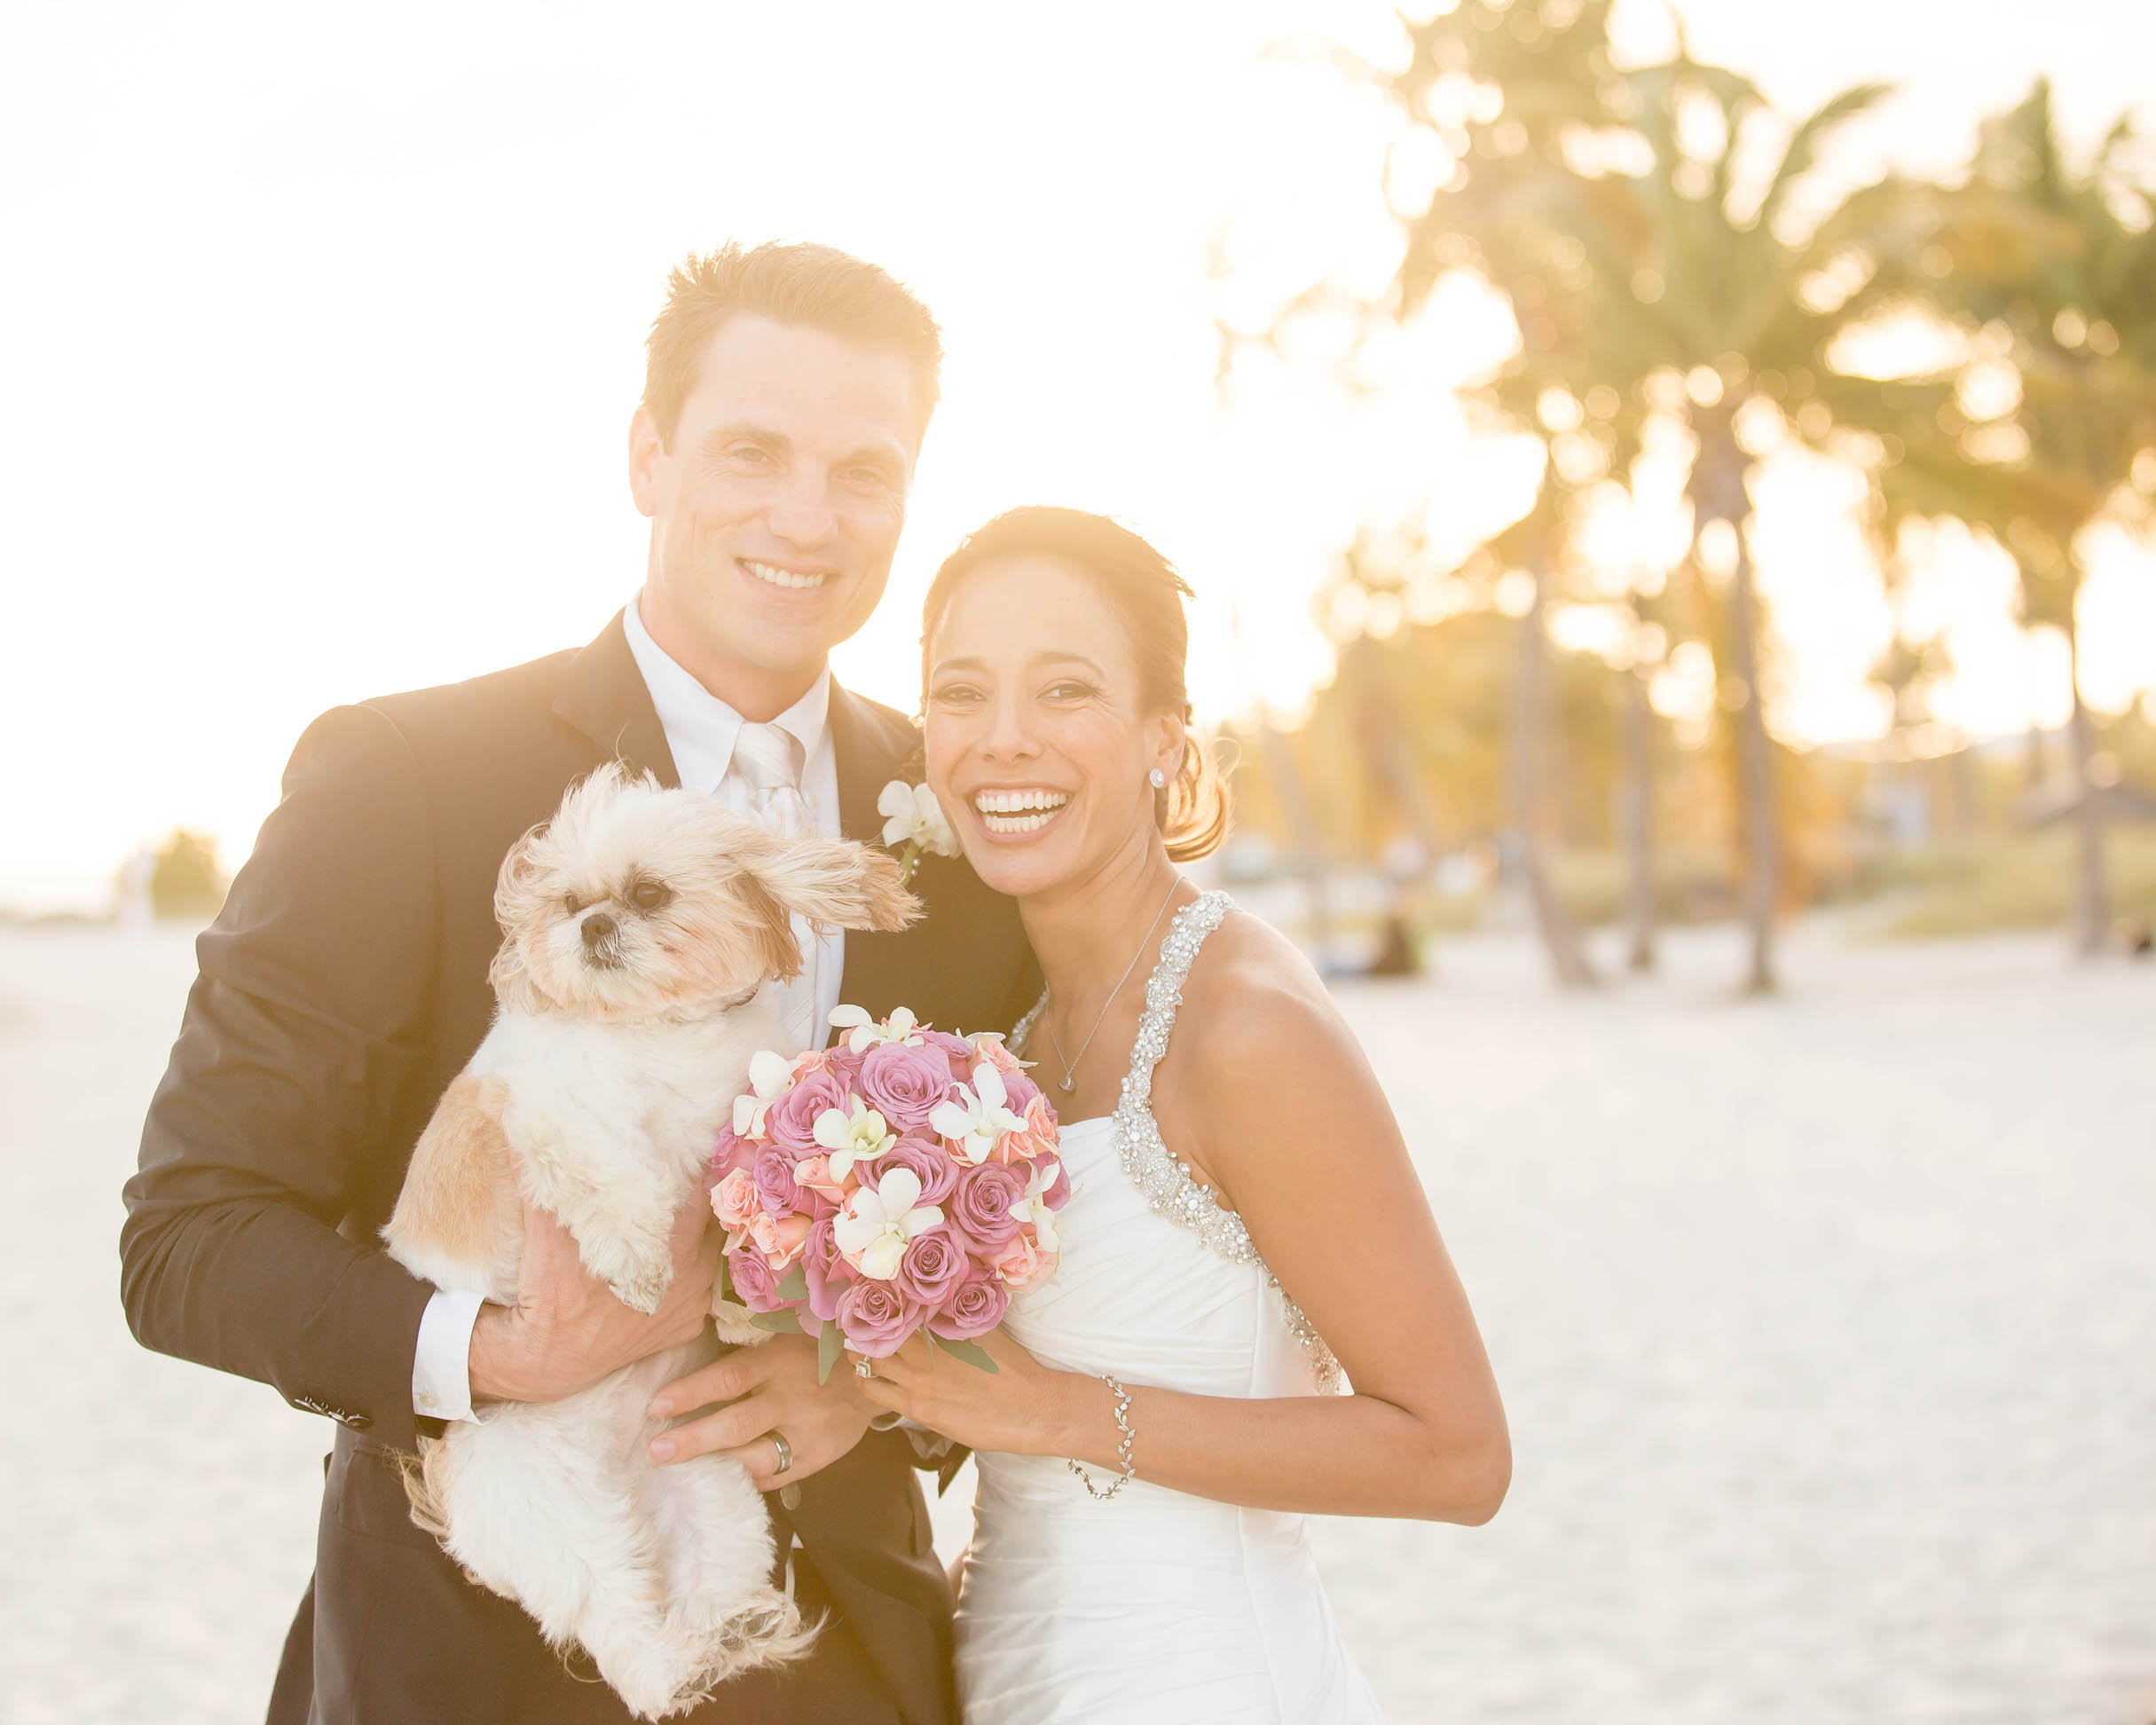 dogs_in_weddings_tiny_house_photo.jpg